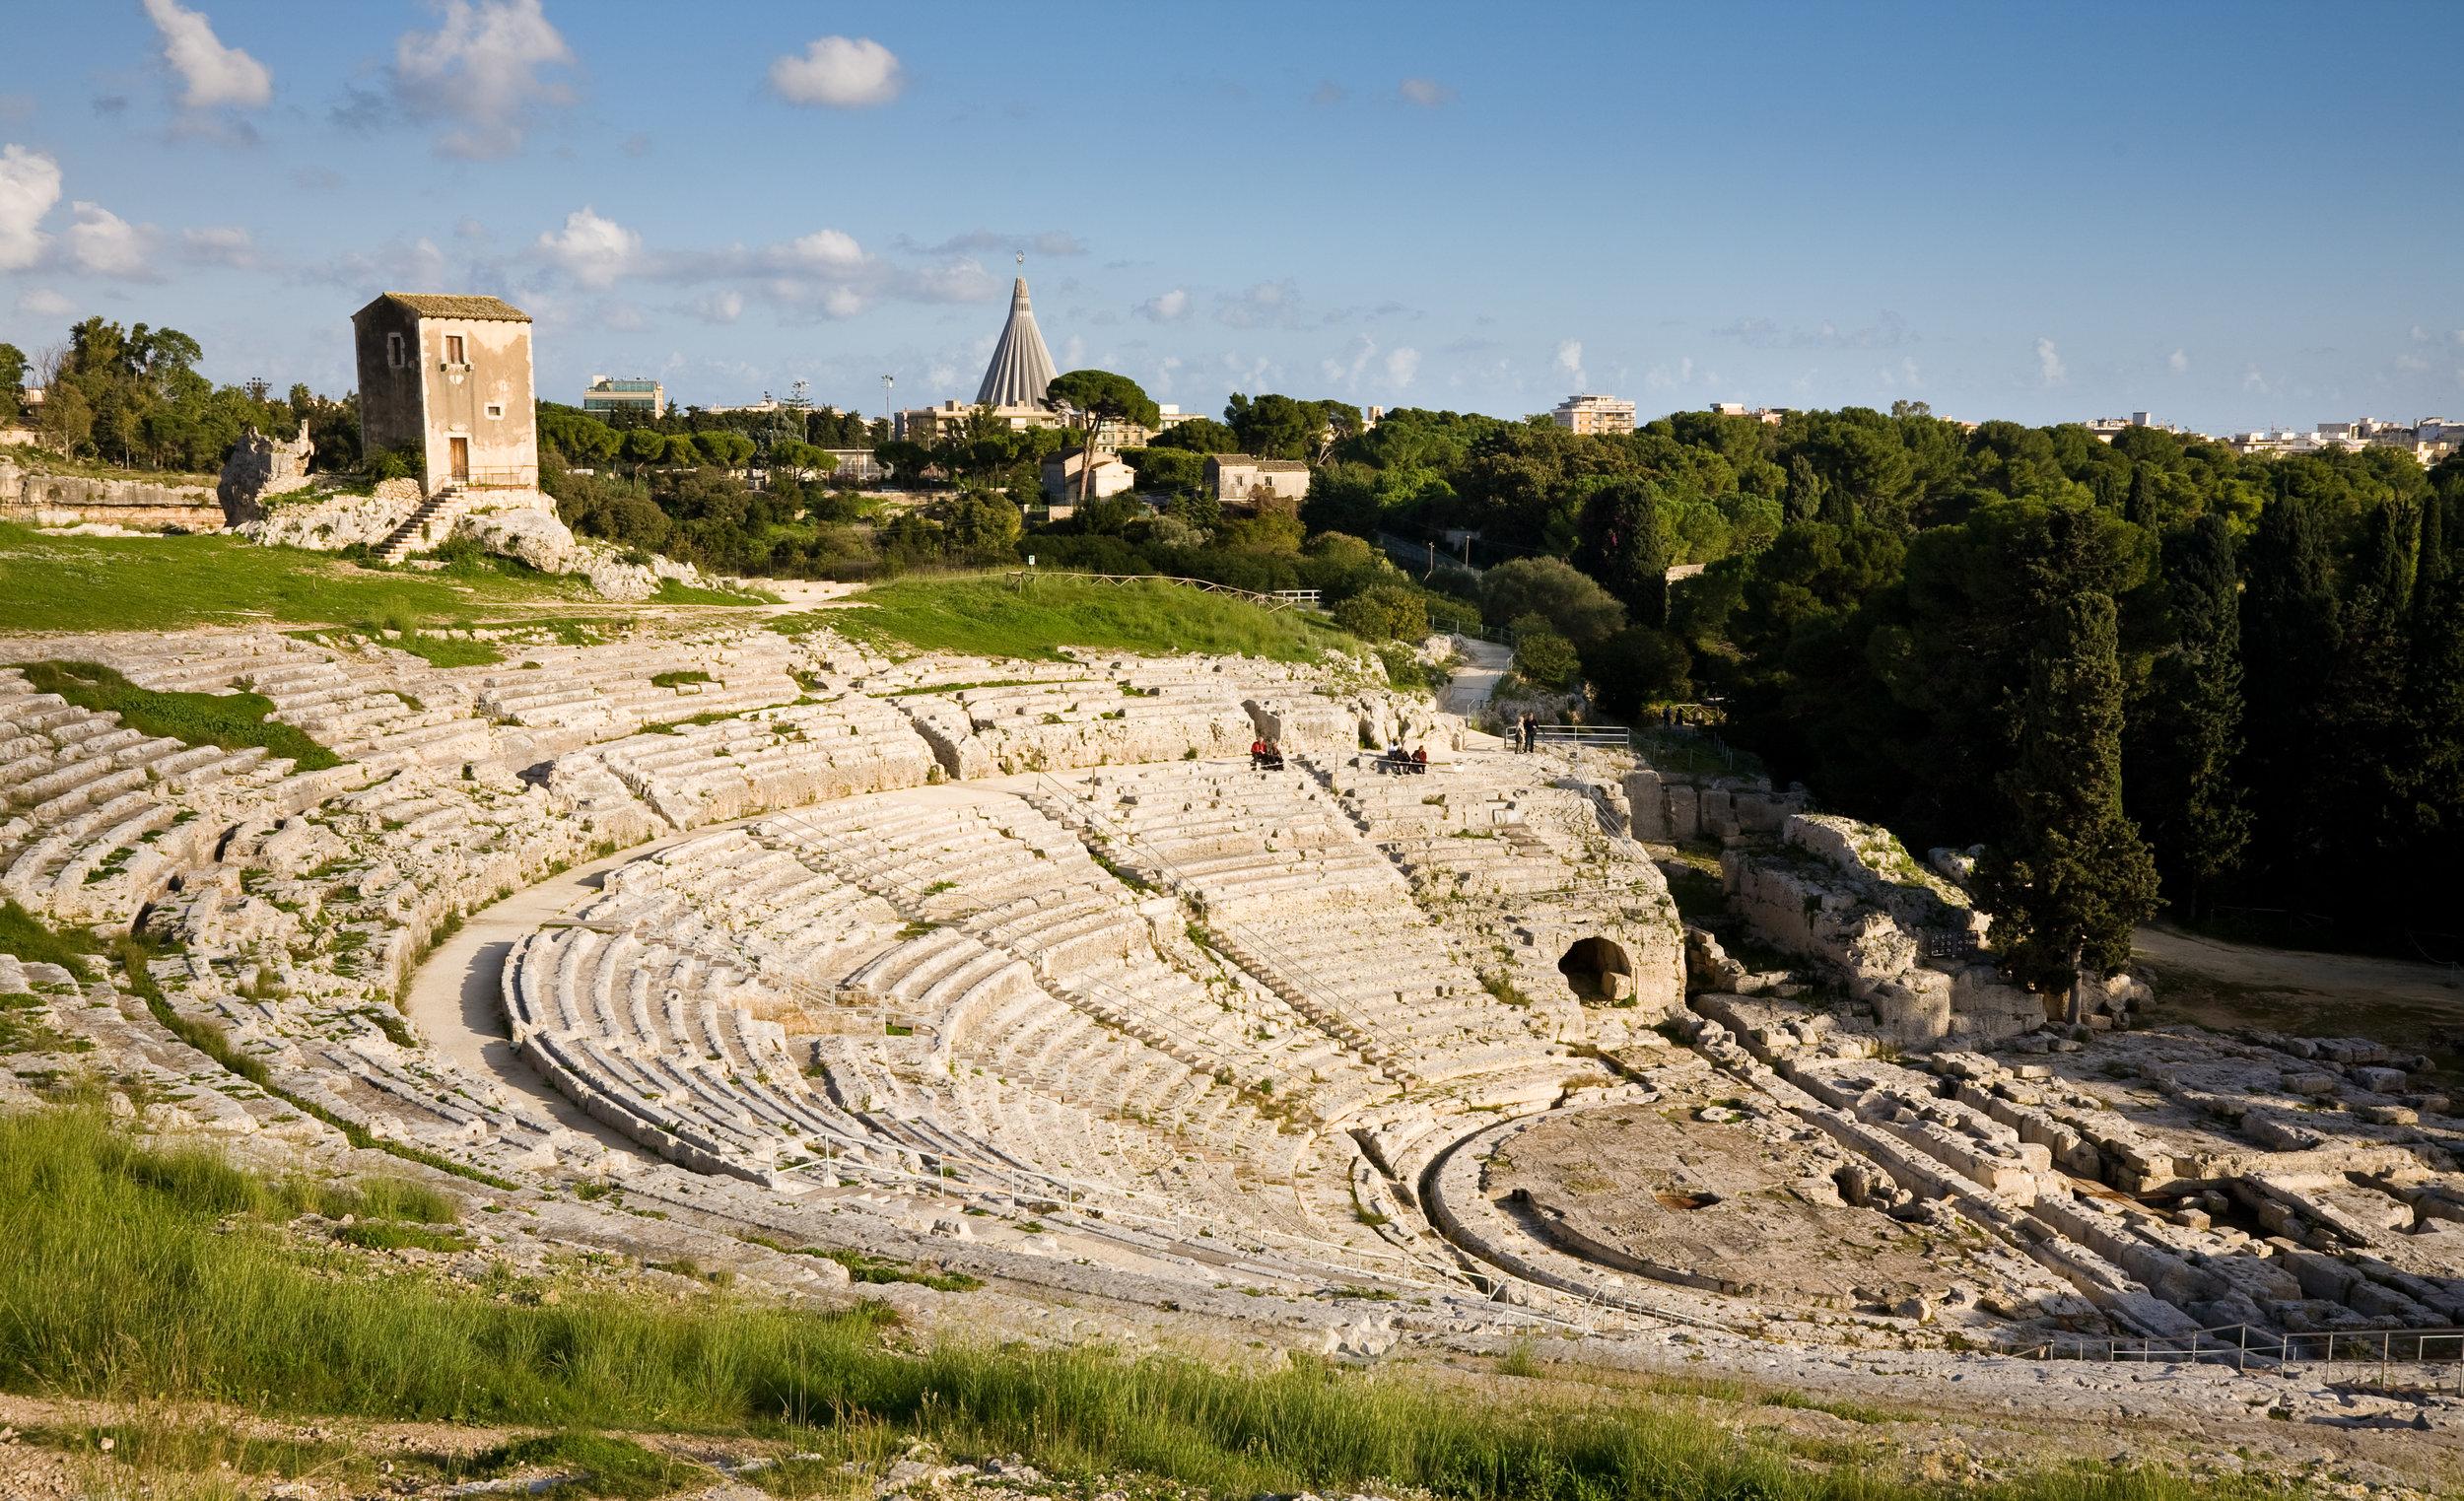 Italian Culinary Tours - Sicily, Italy Tour